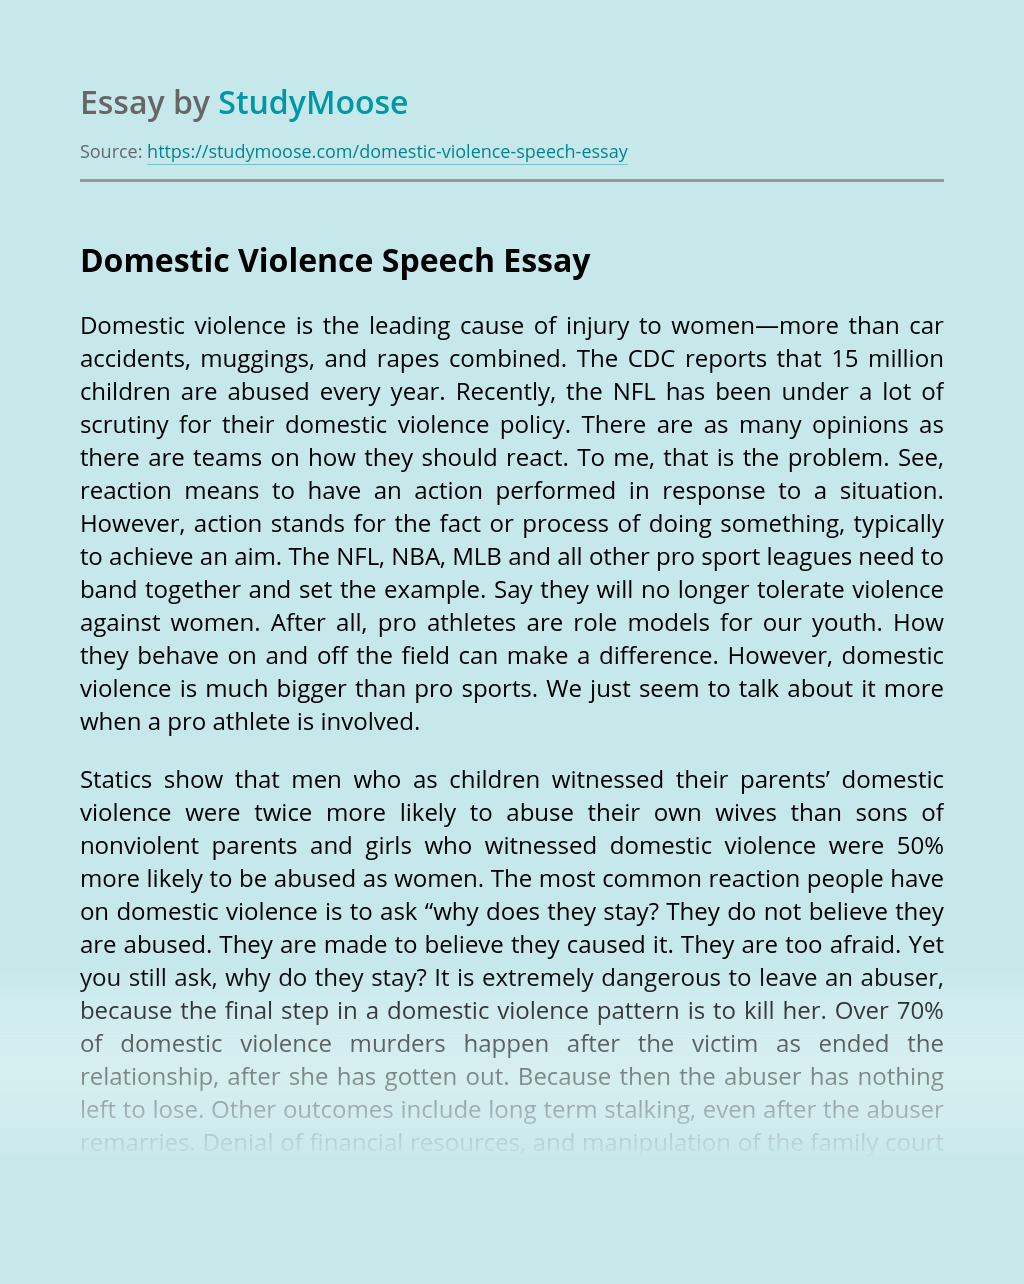 Domestic Violence Speech